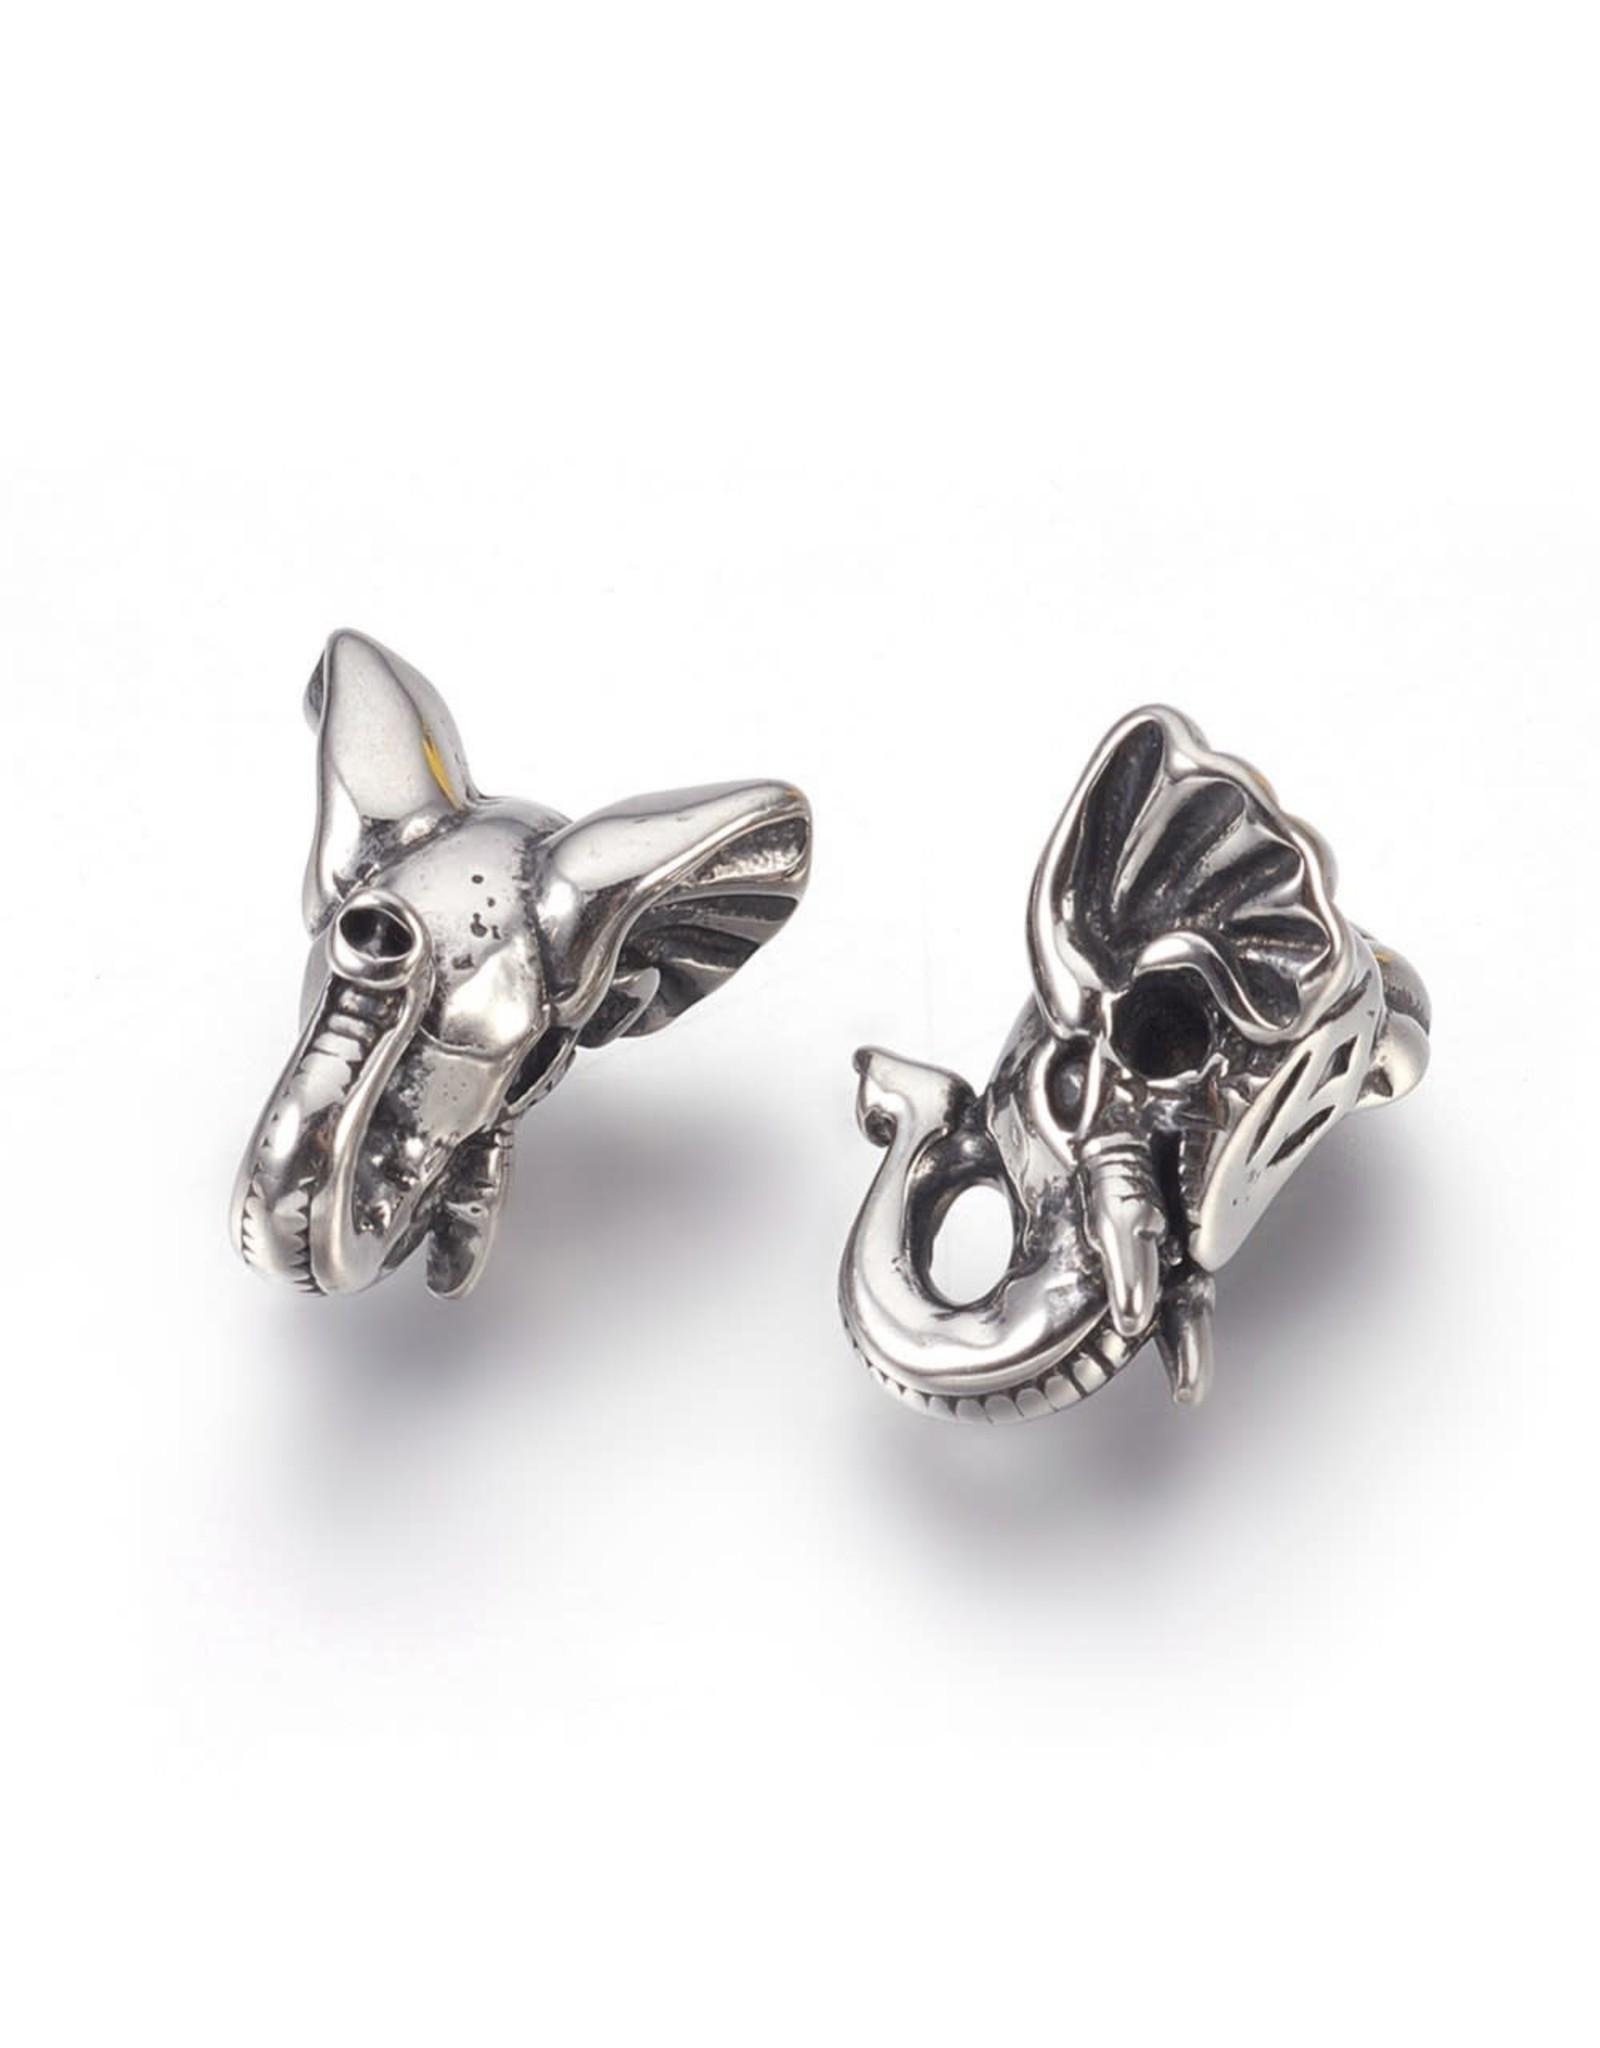 Elephant  Head Bead  Stainless Steel  16x13x8mm  x1  NF